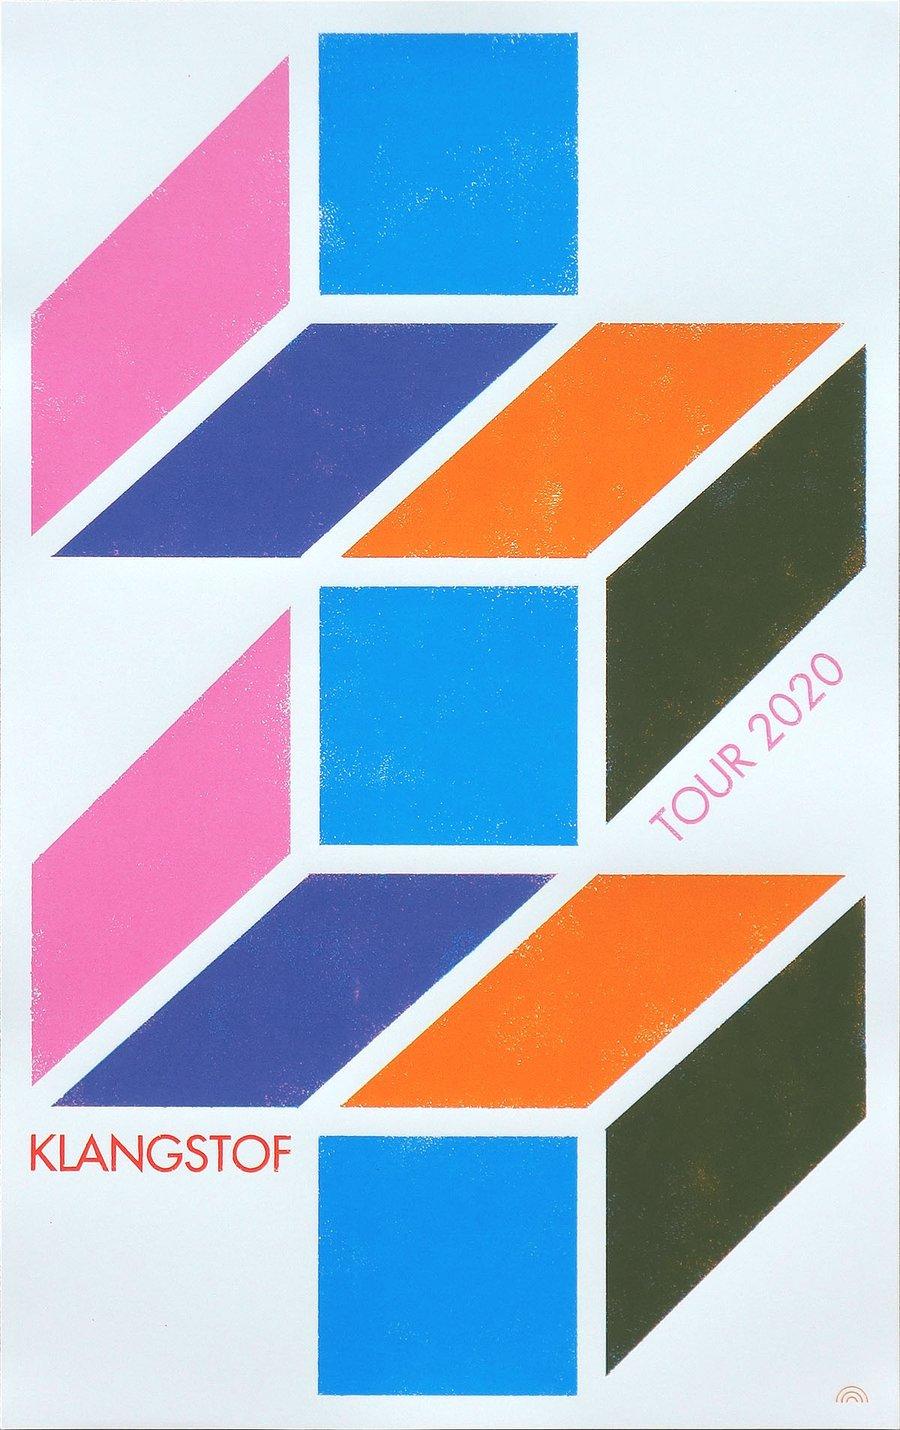 Image of KLANGSTOF